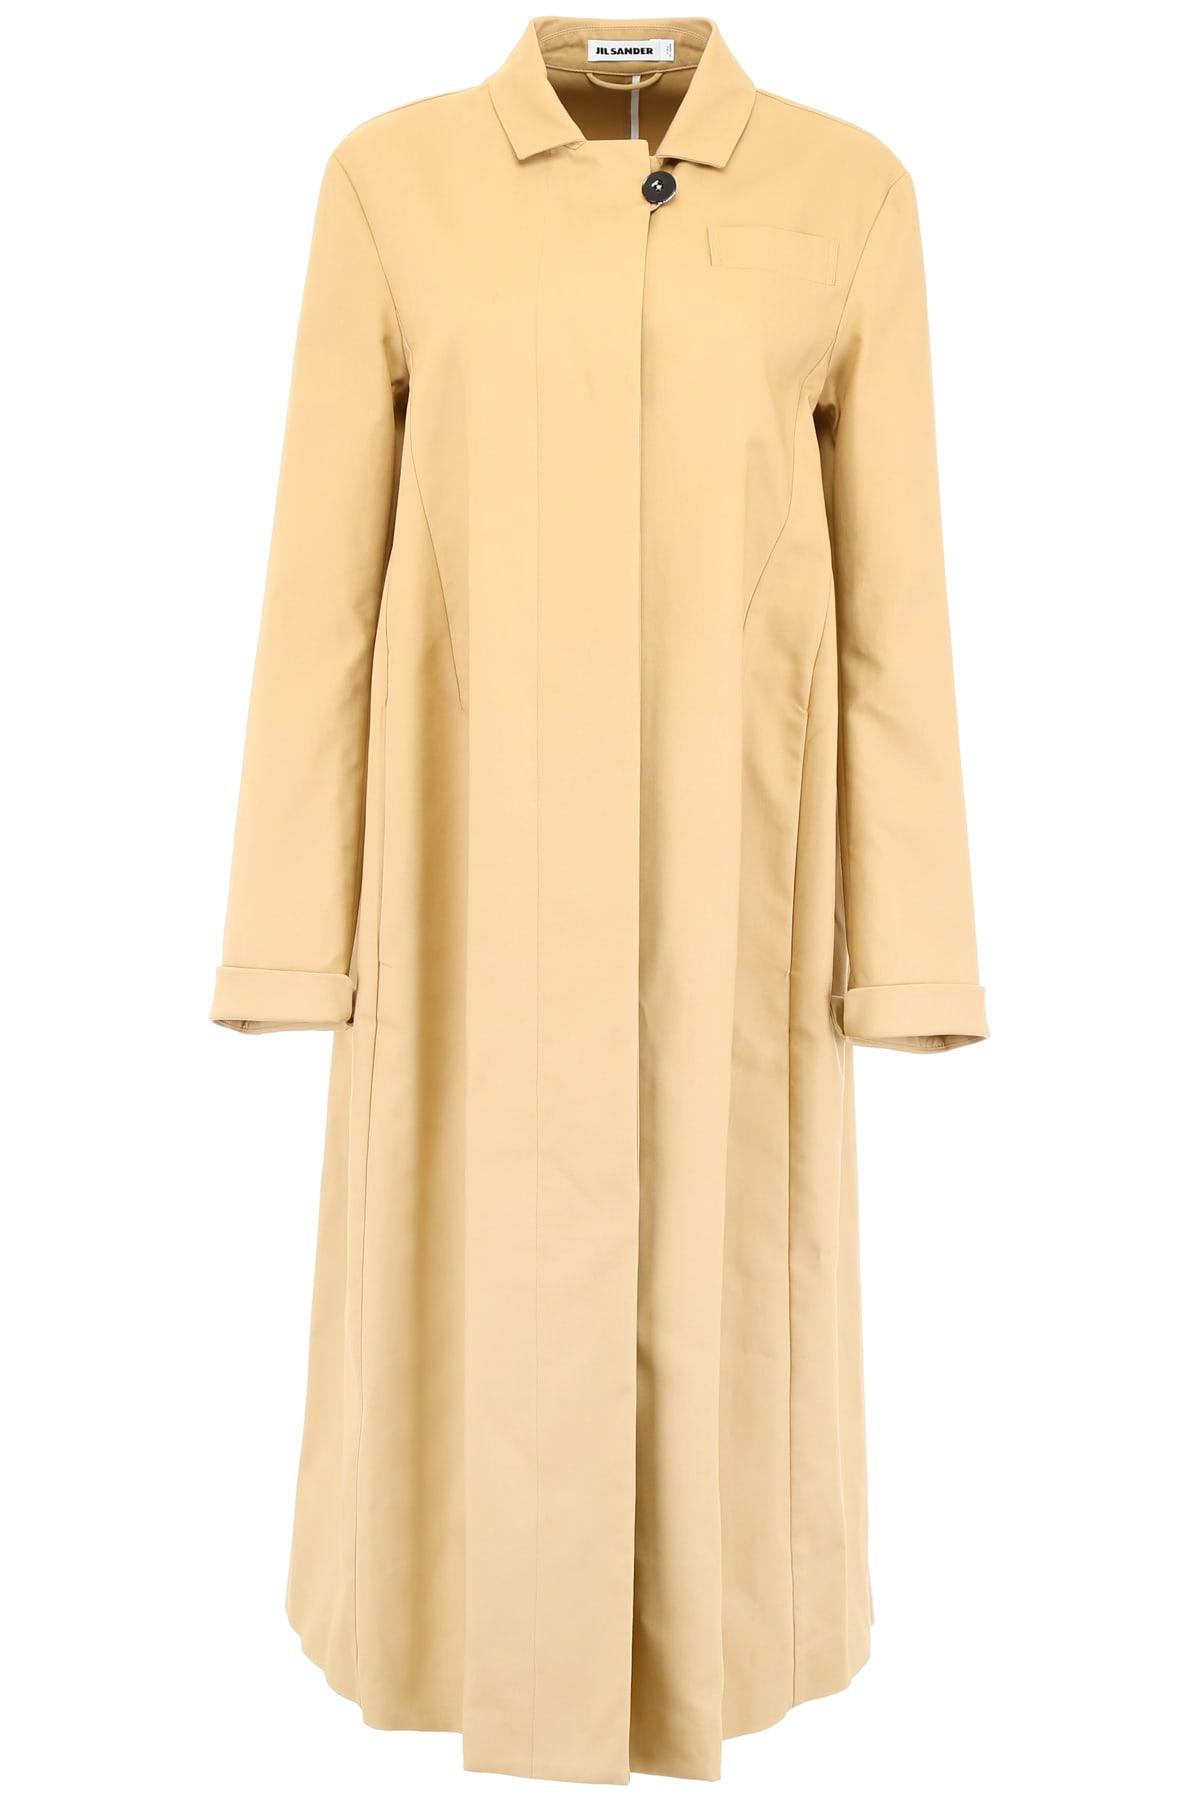 Jil Sander Deconstructed Coat